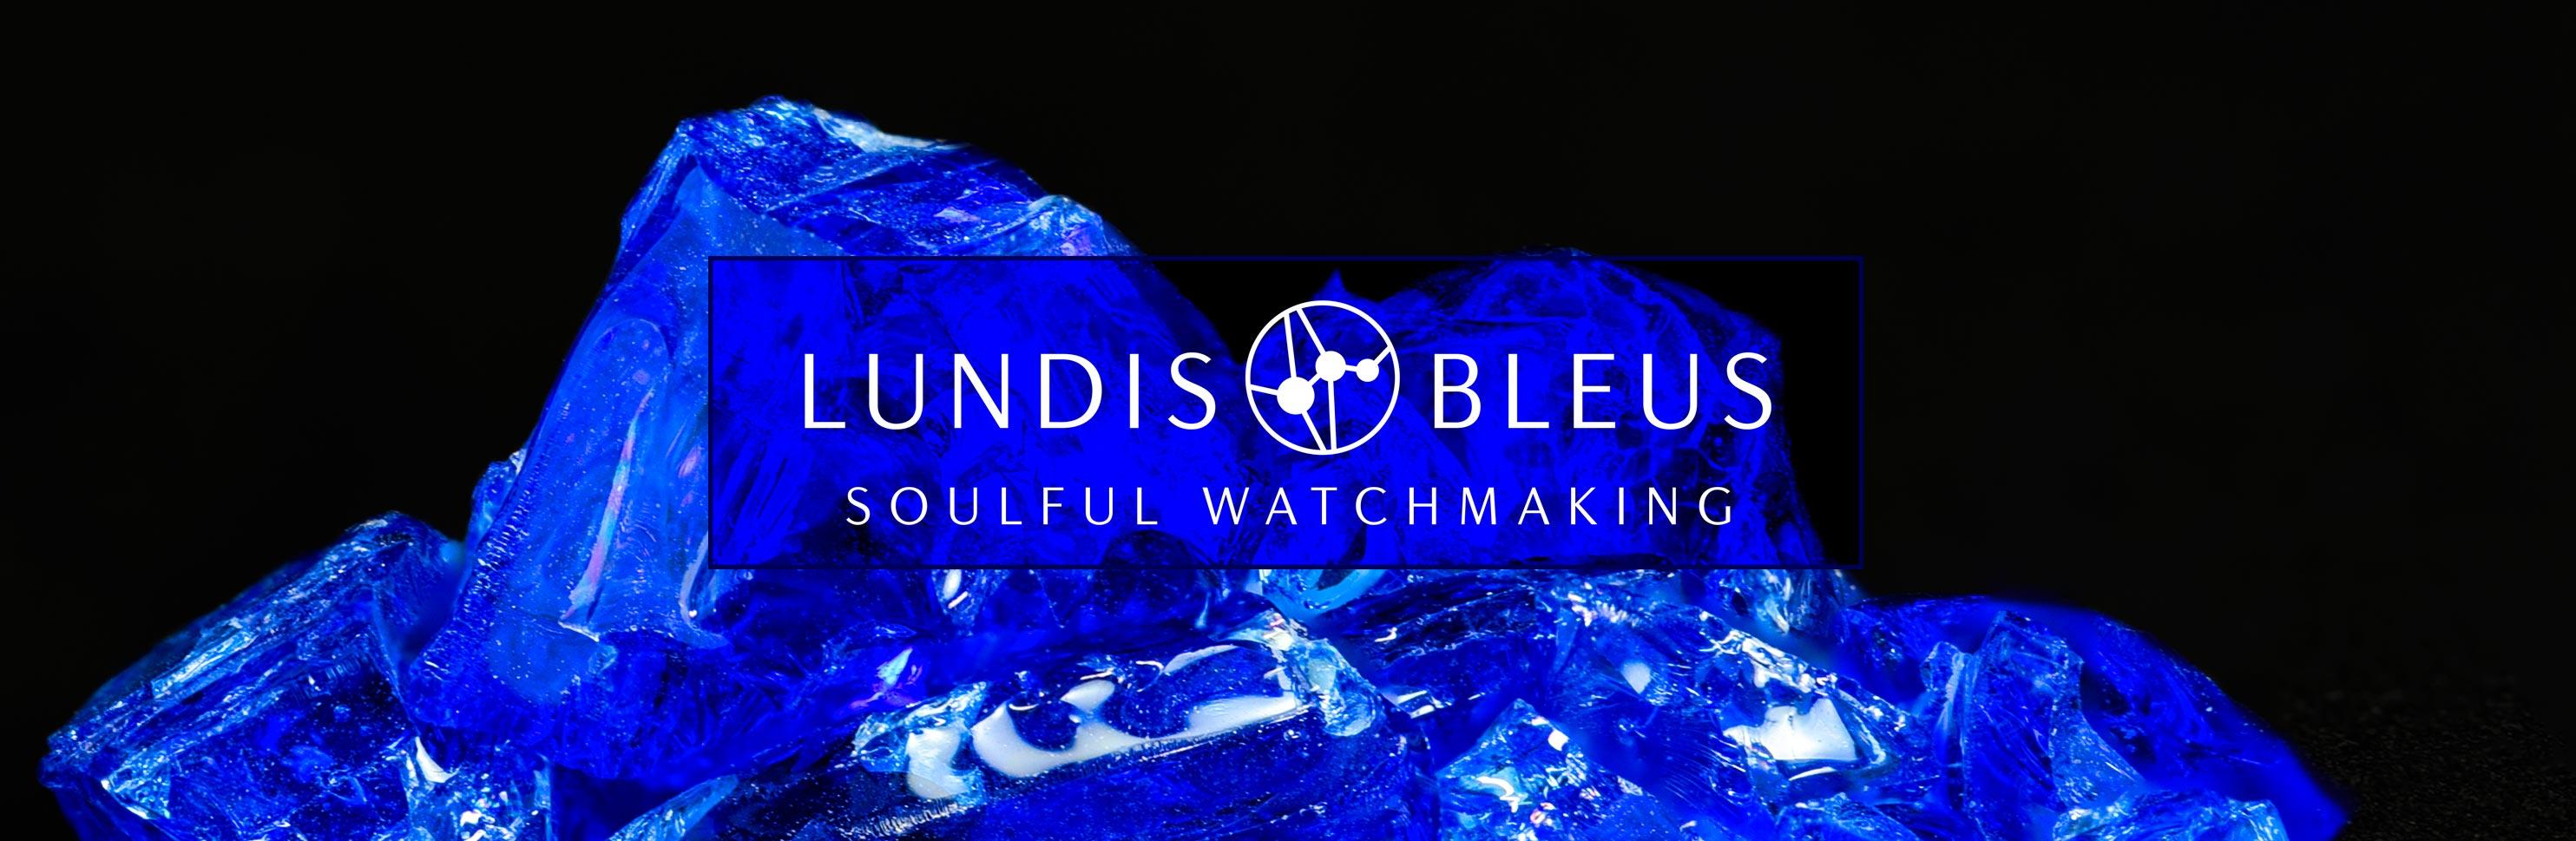 Lundis Bleus - Discover Us